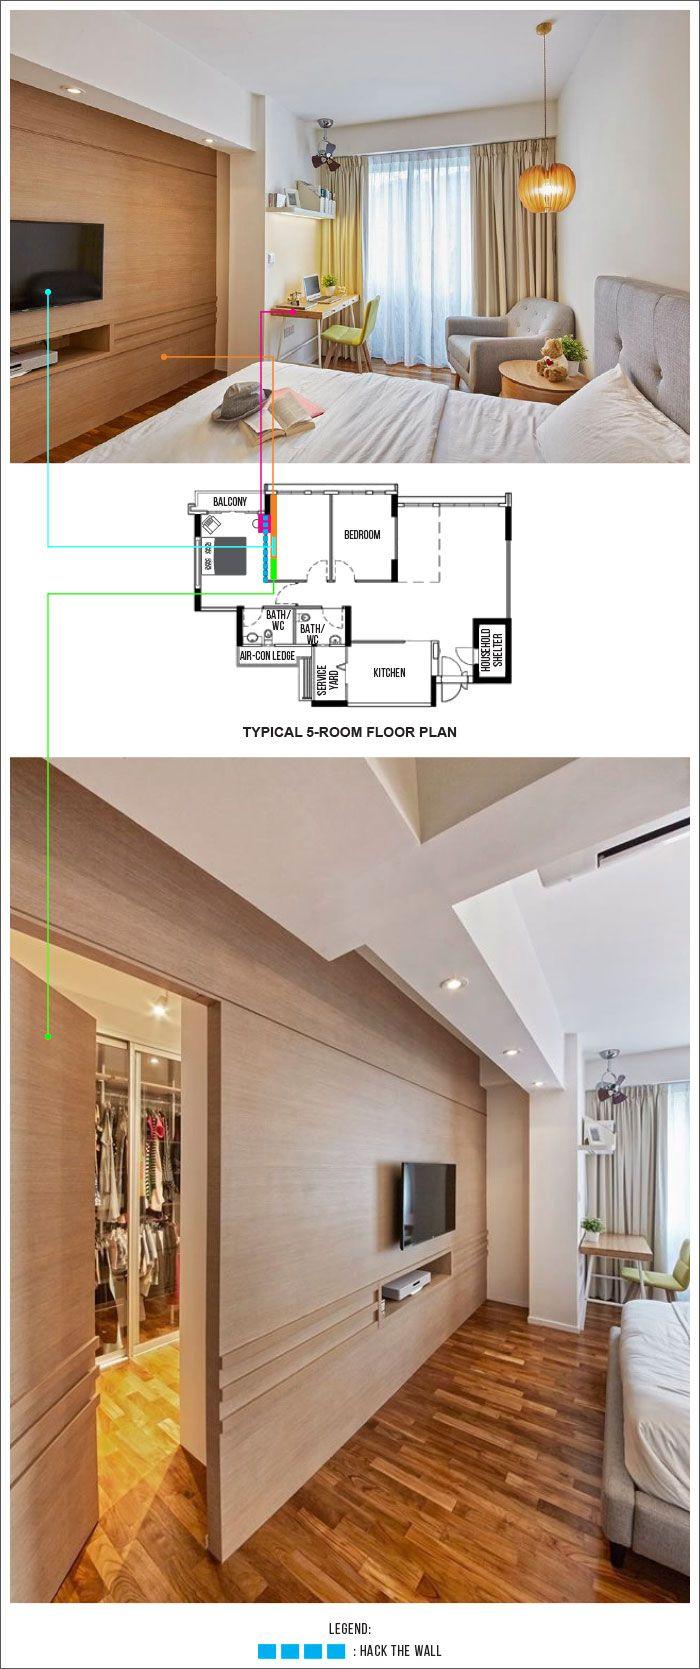 Punggol brooke water way hdb 5 room renovation - 15 Interesting Layout Designs For Waterway Cascadia